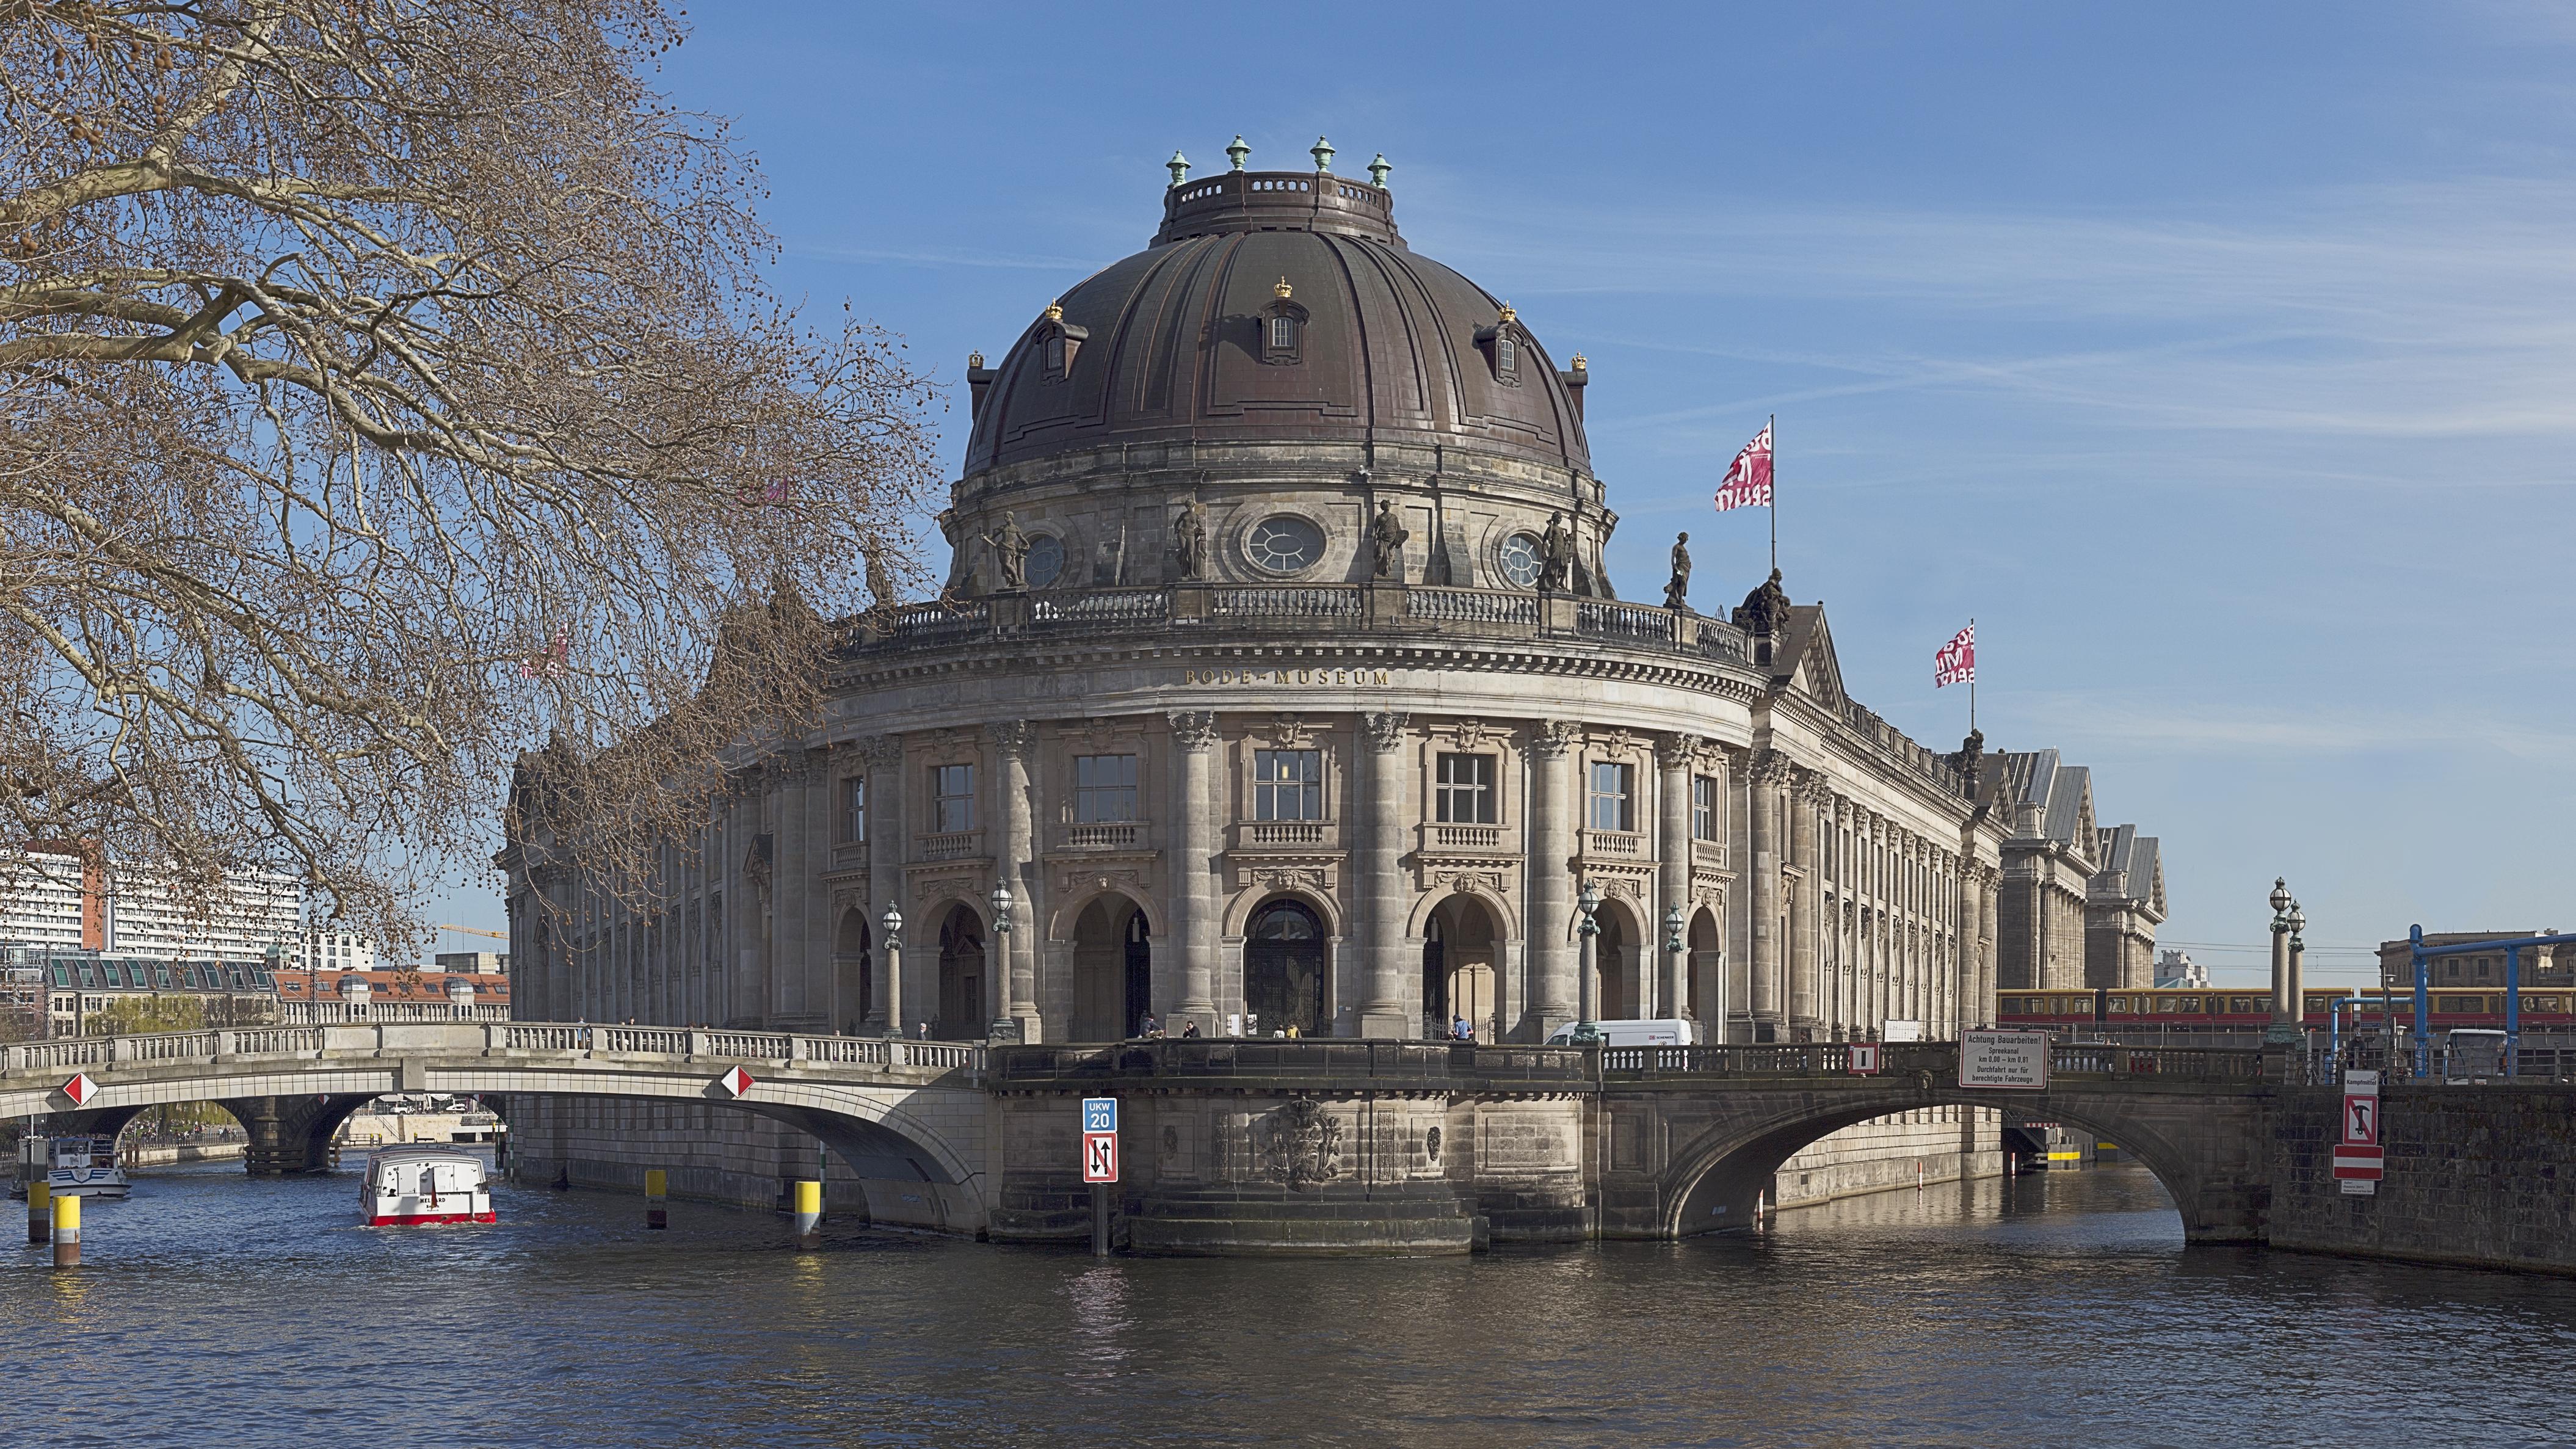 Bodemuseum, Museumsinsel Berlin